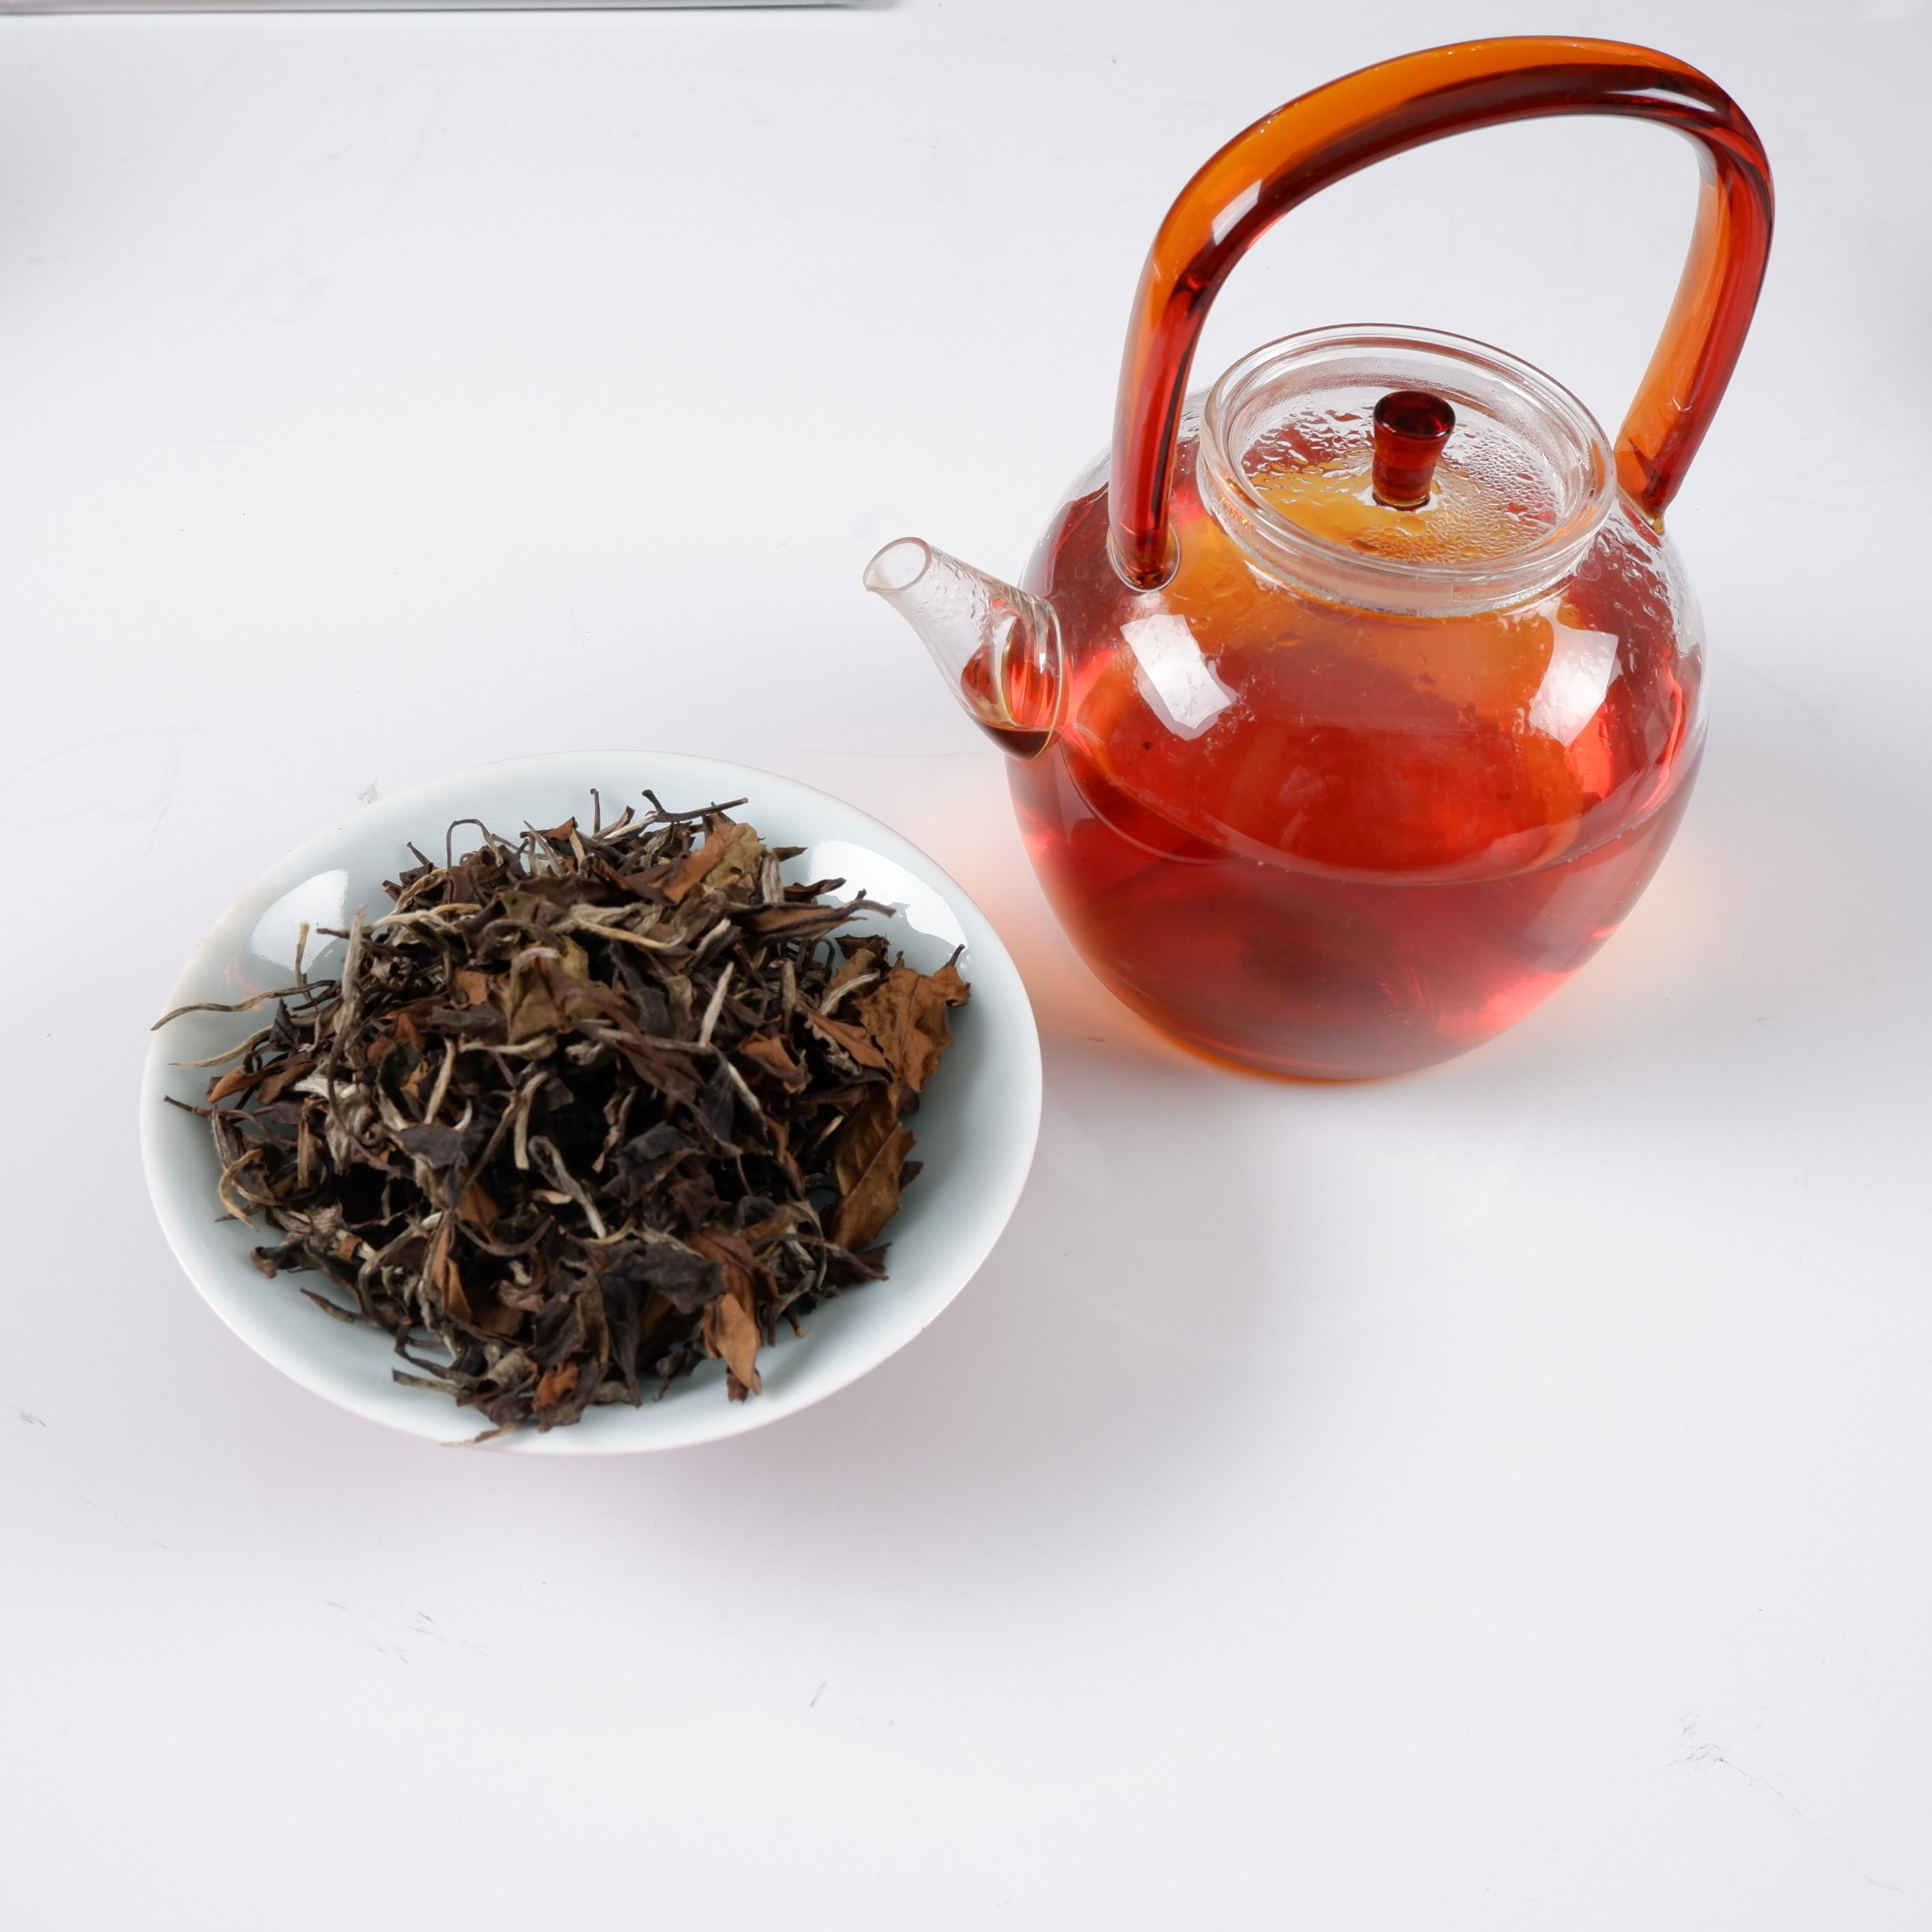 Chinese White Tea Shoumei Aged Tea Leave - 4uTea | 4uTea.com